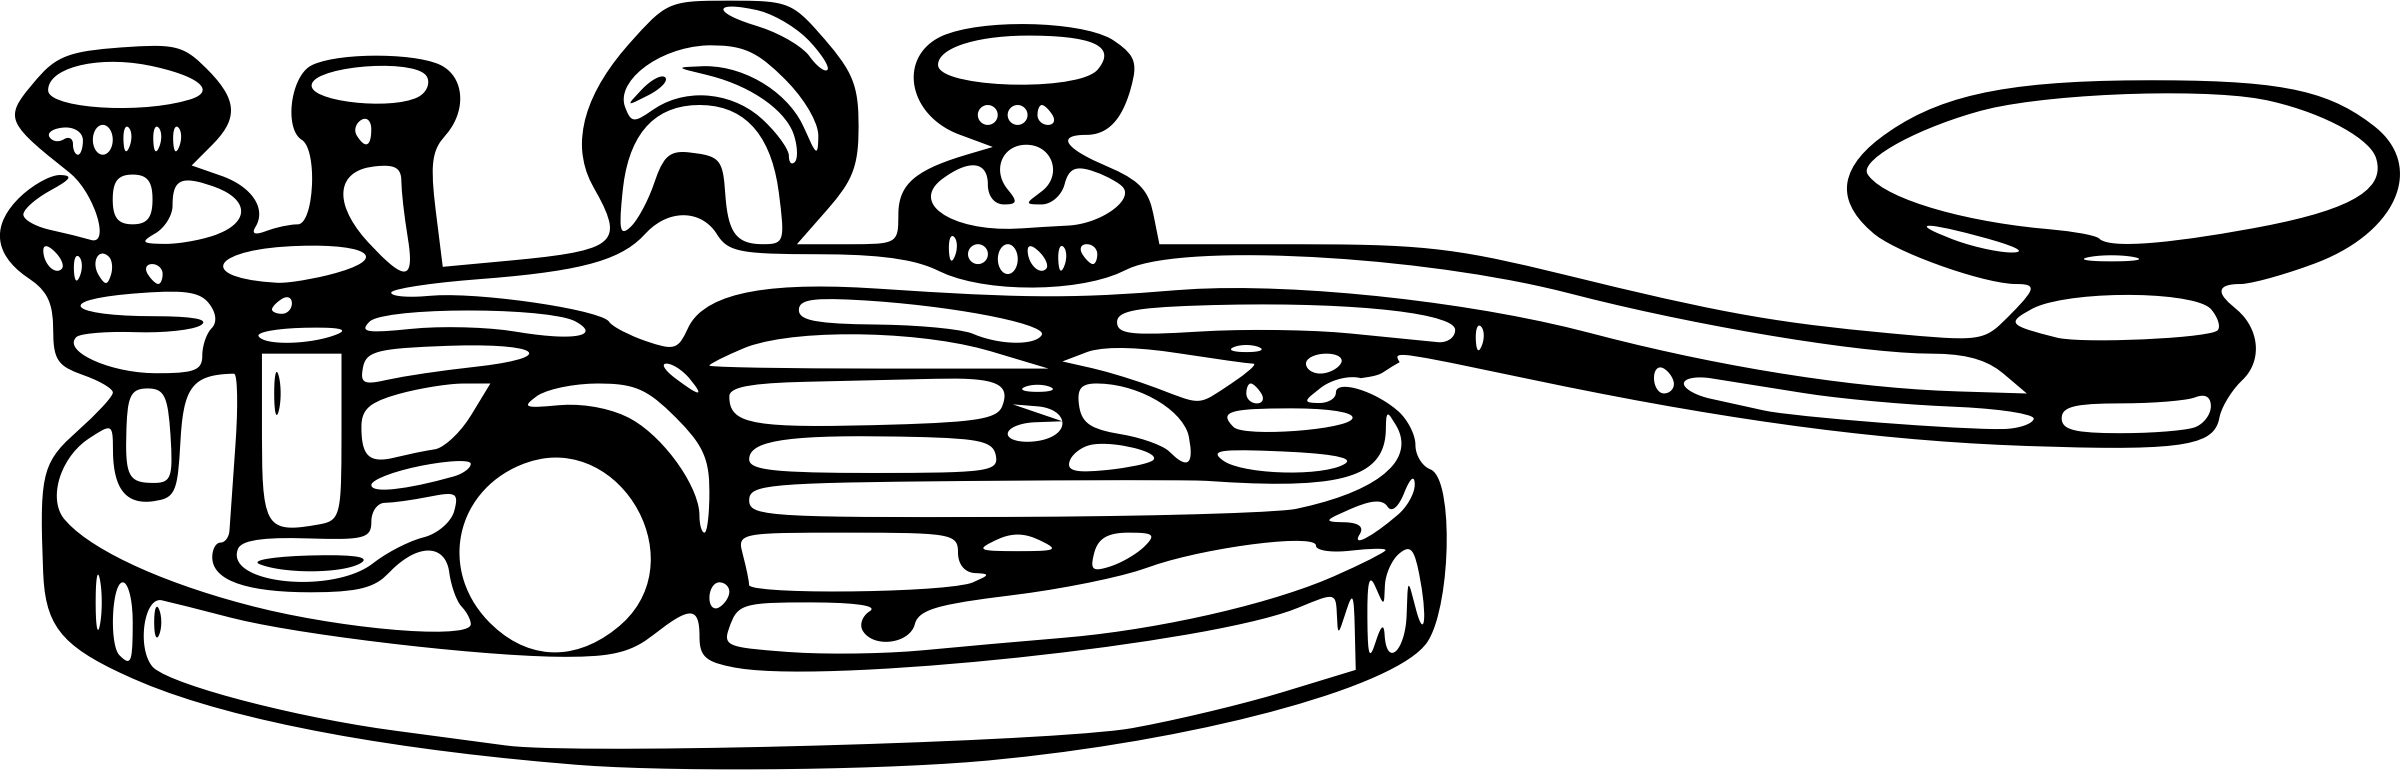 2400x770 Clipart